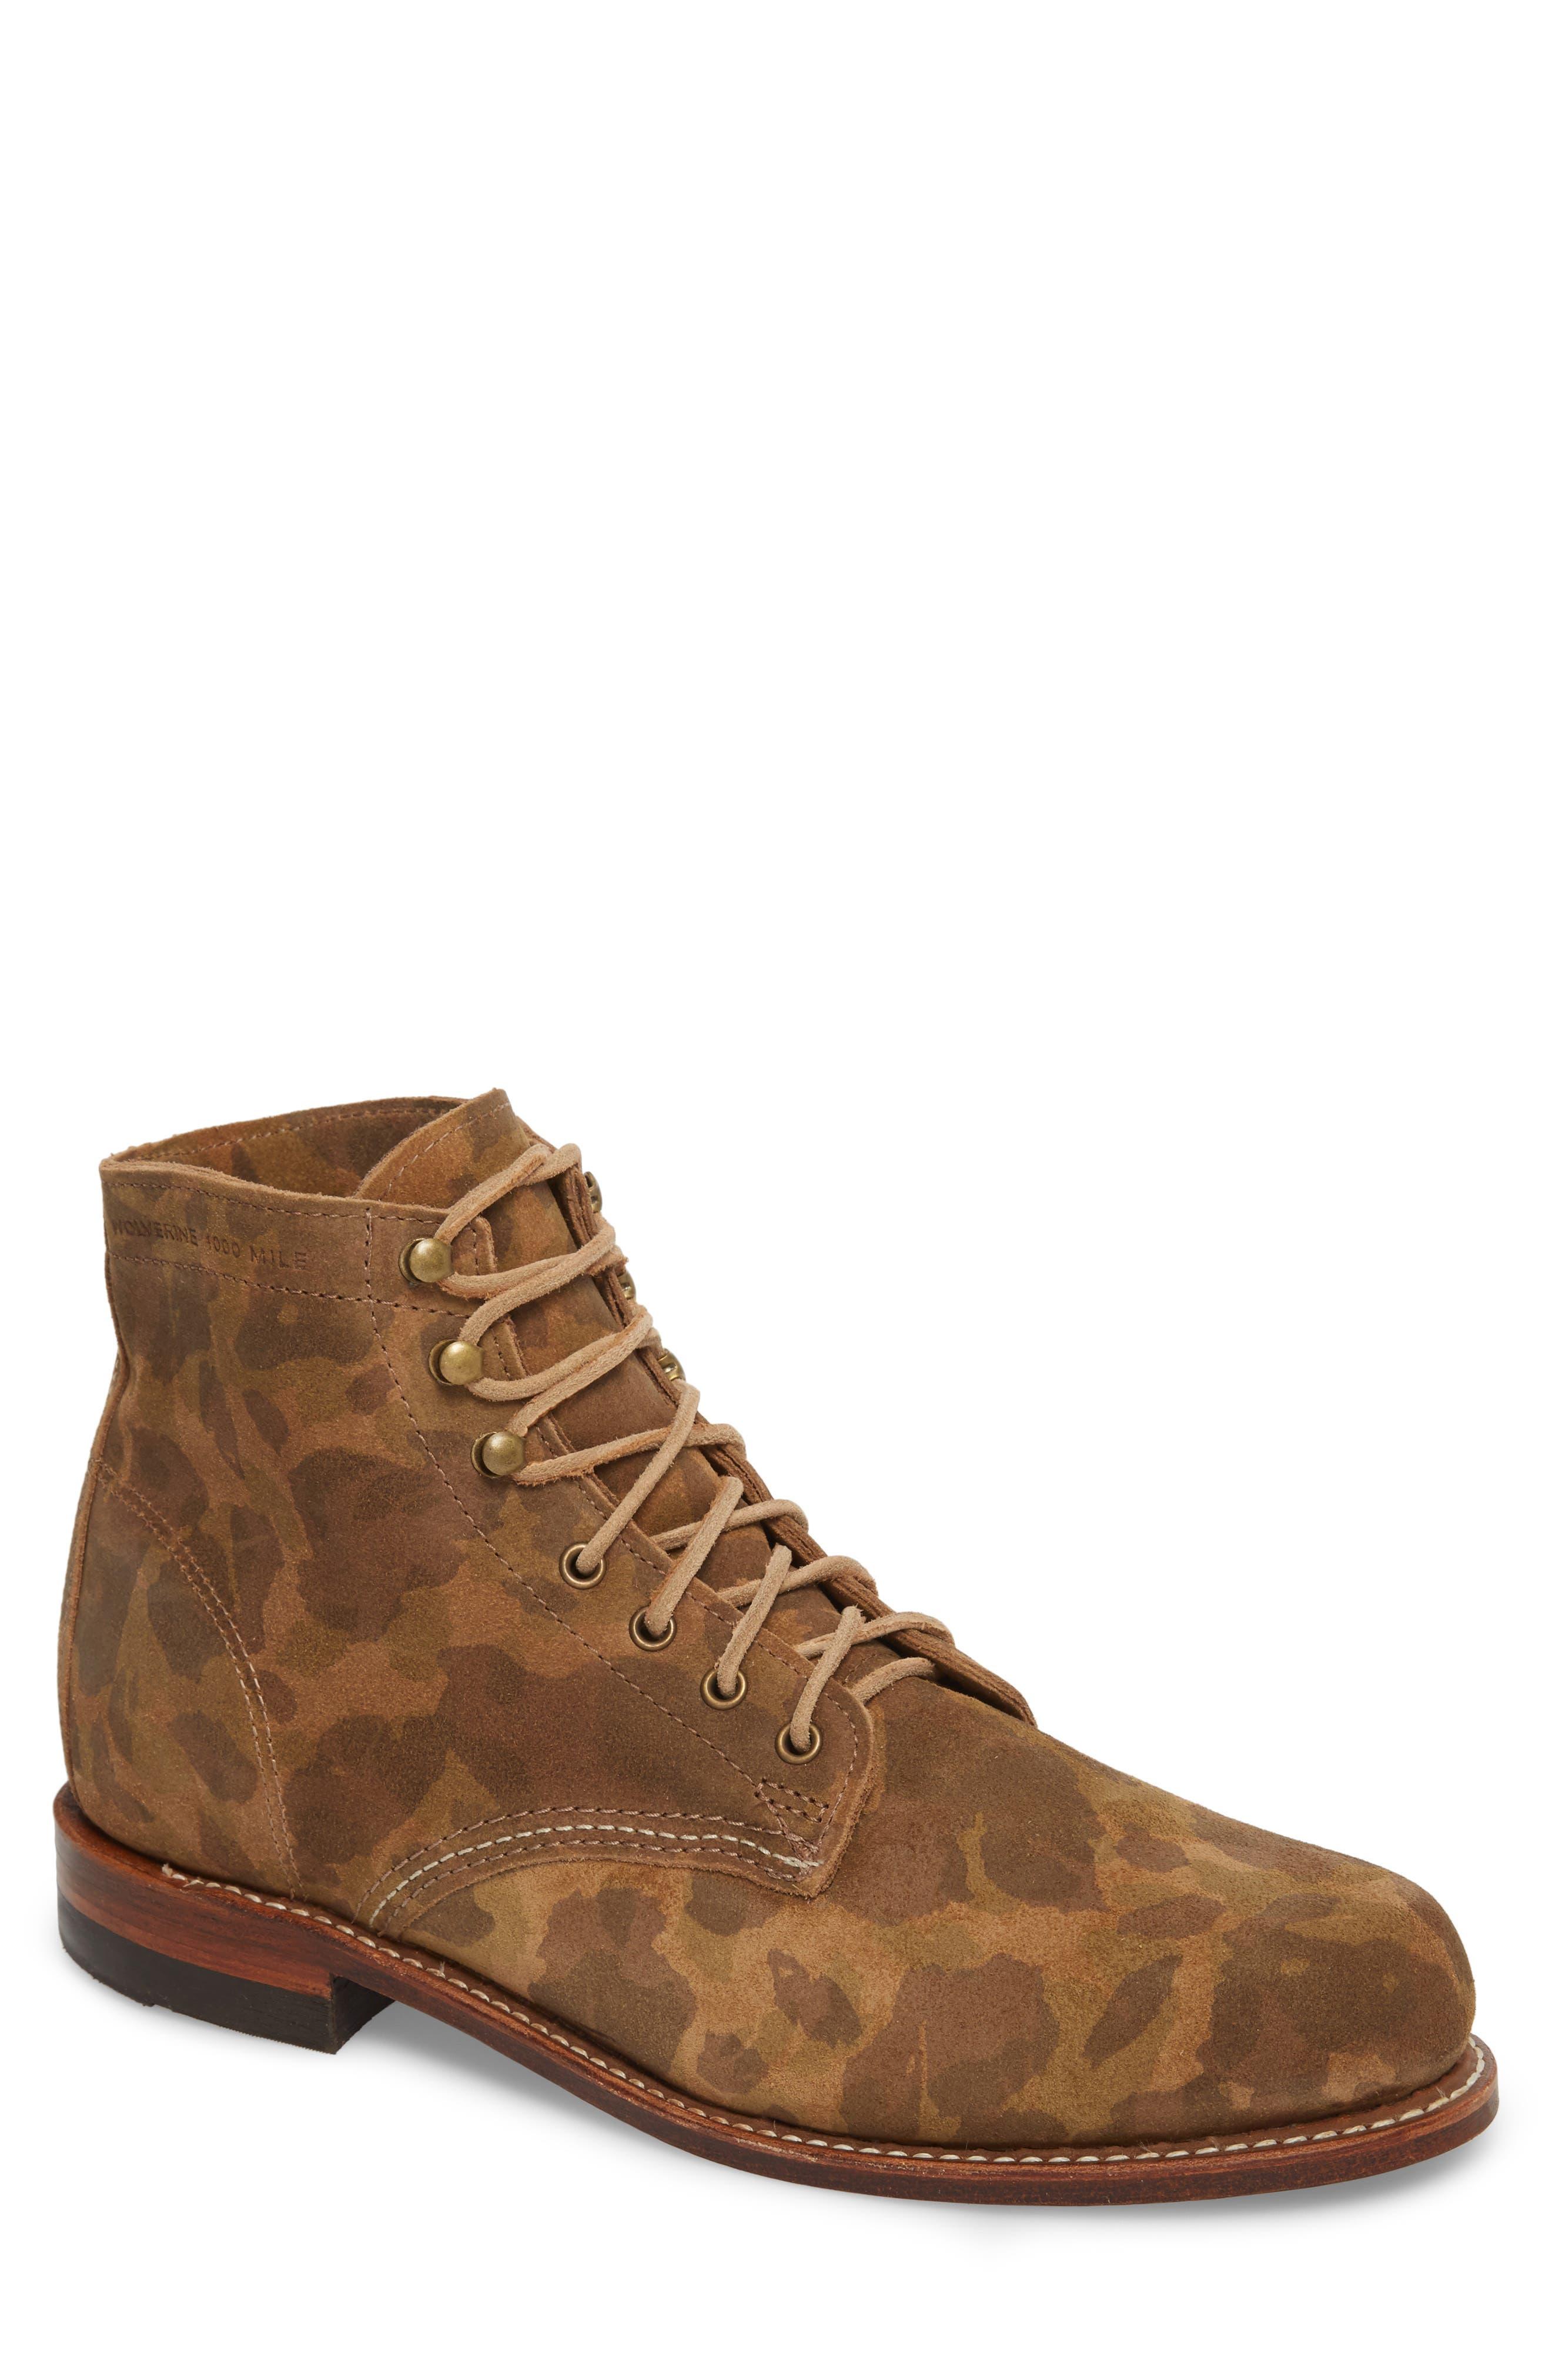 1000 Mile Original Boot,                         Main,                         color, 350